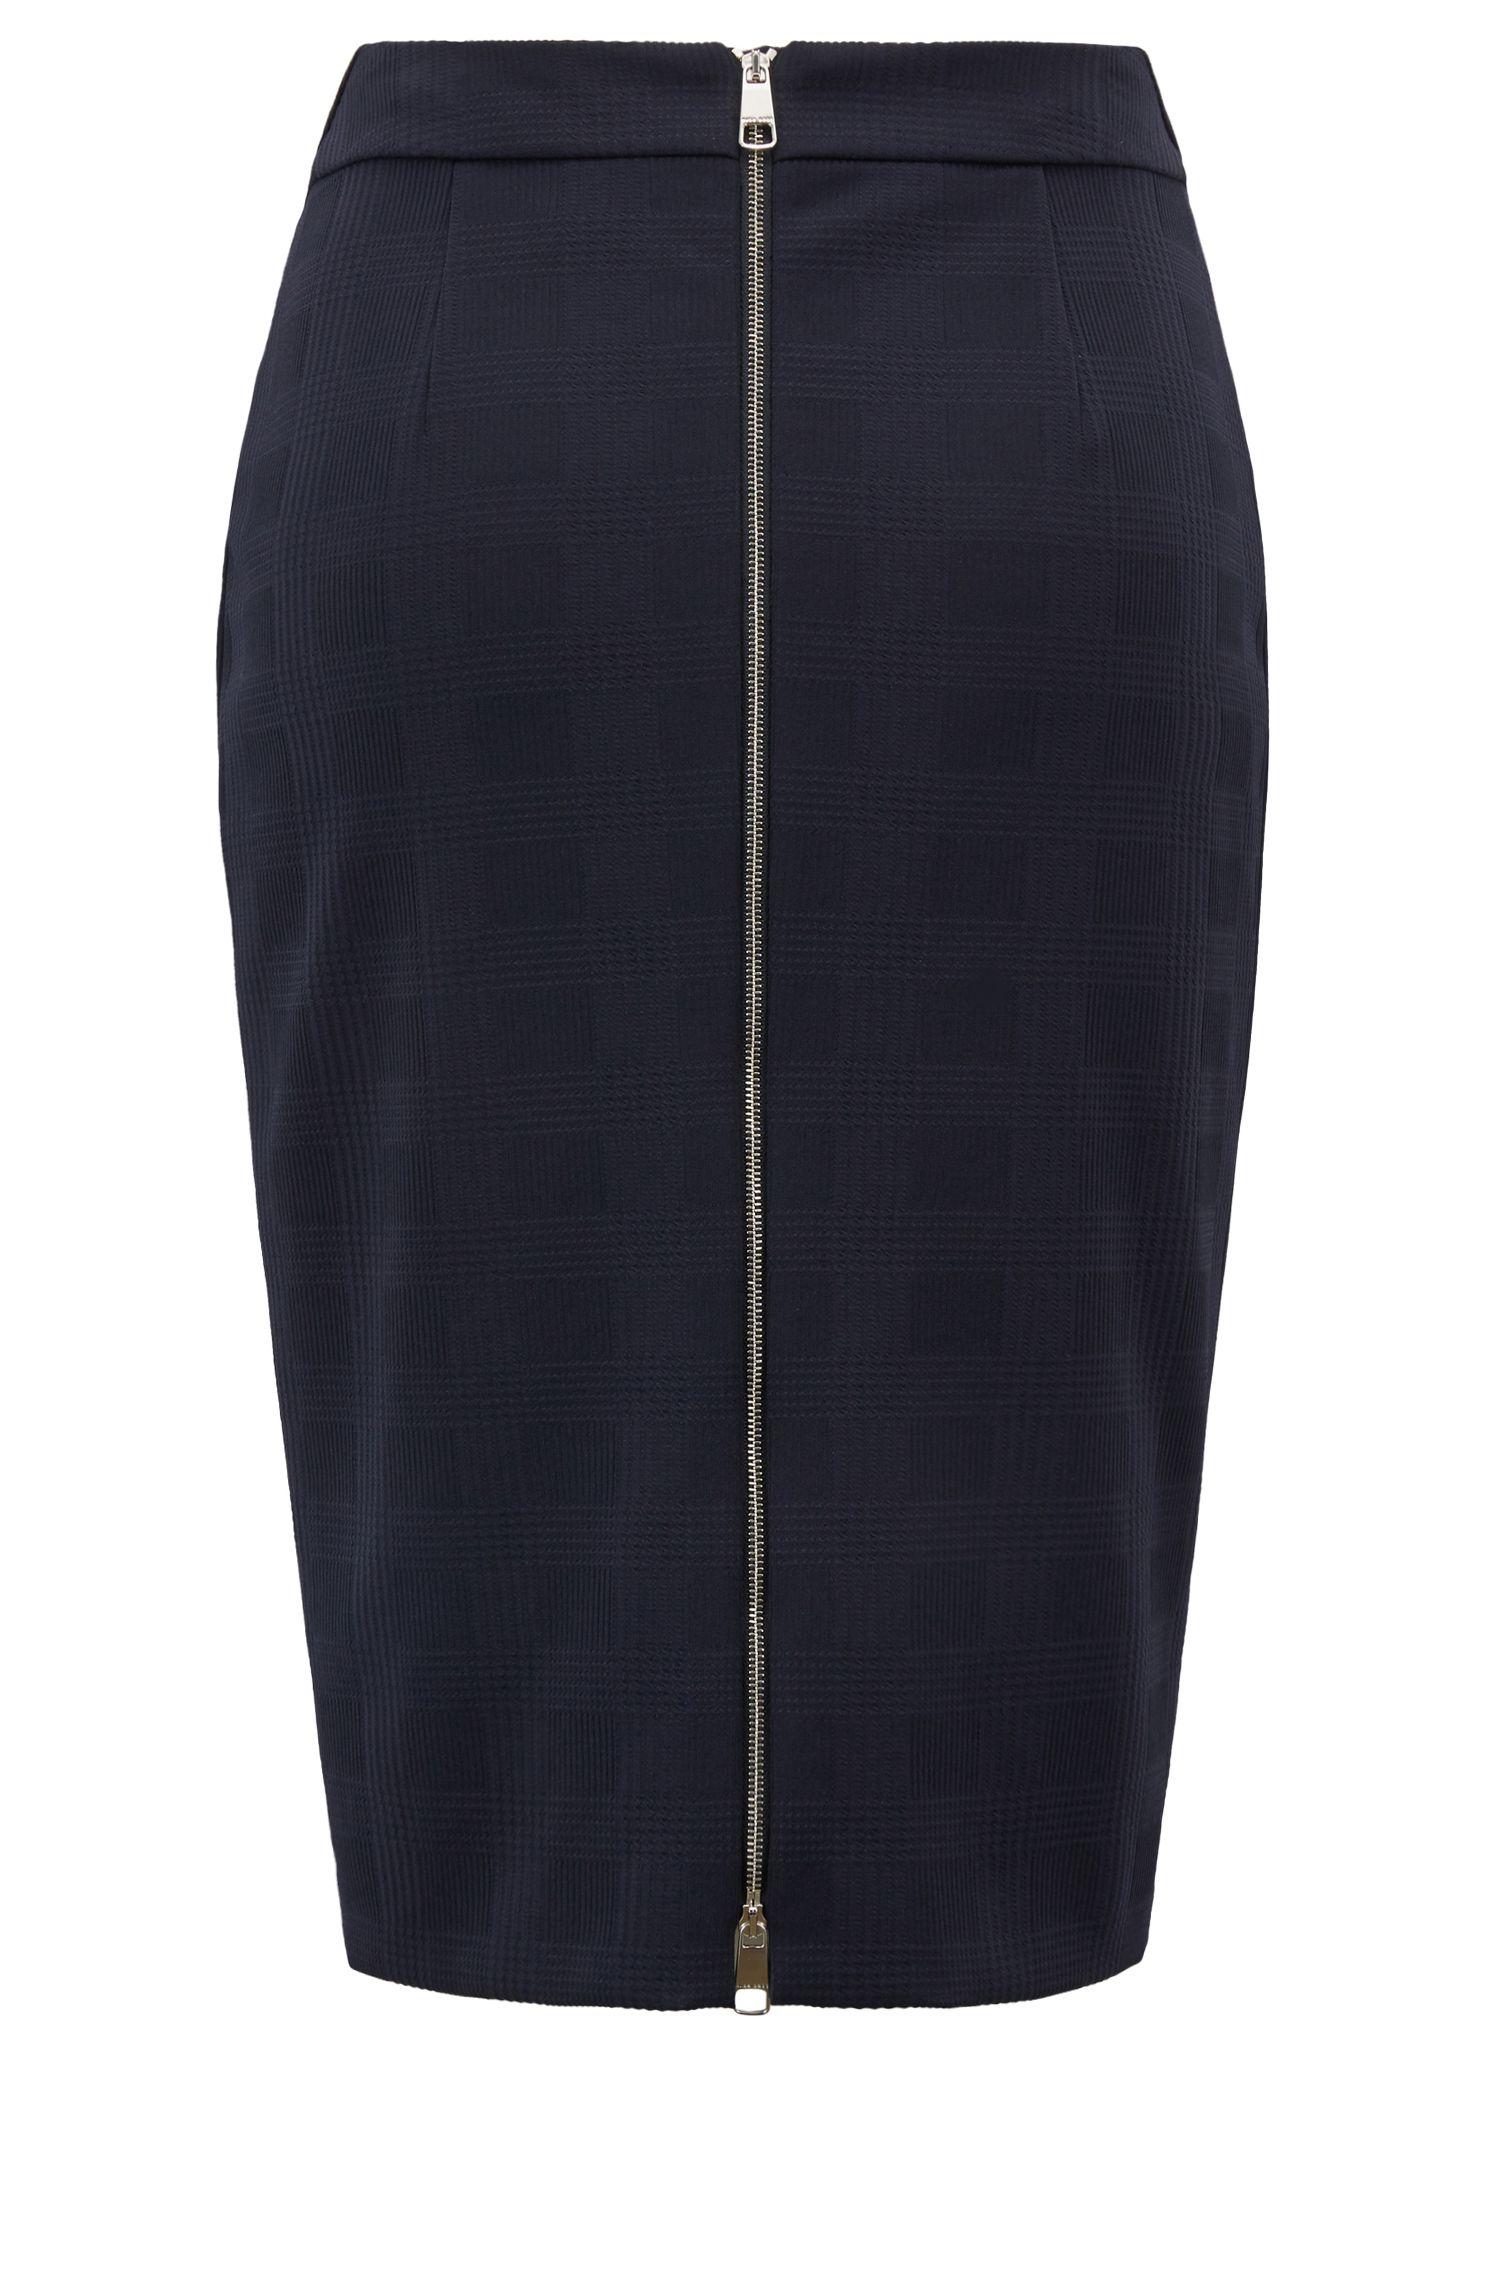 Falda lápiz de punto elástico con cremallera bidireccional trasera, Azul oscuro